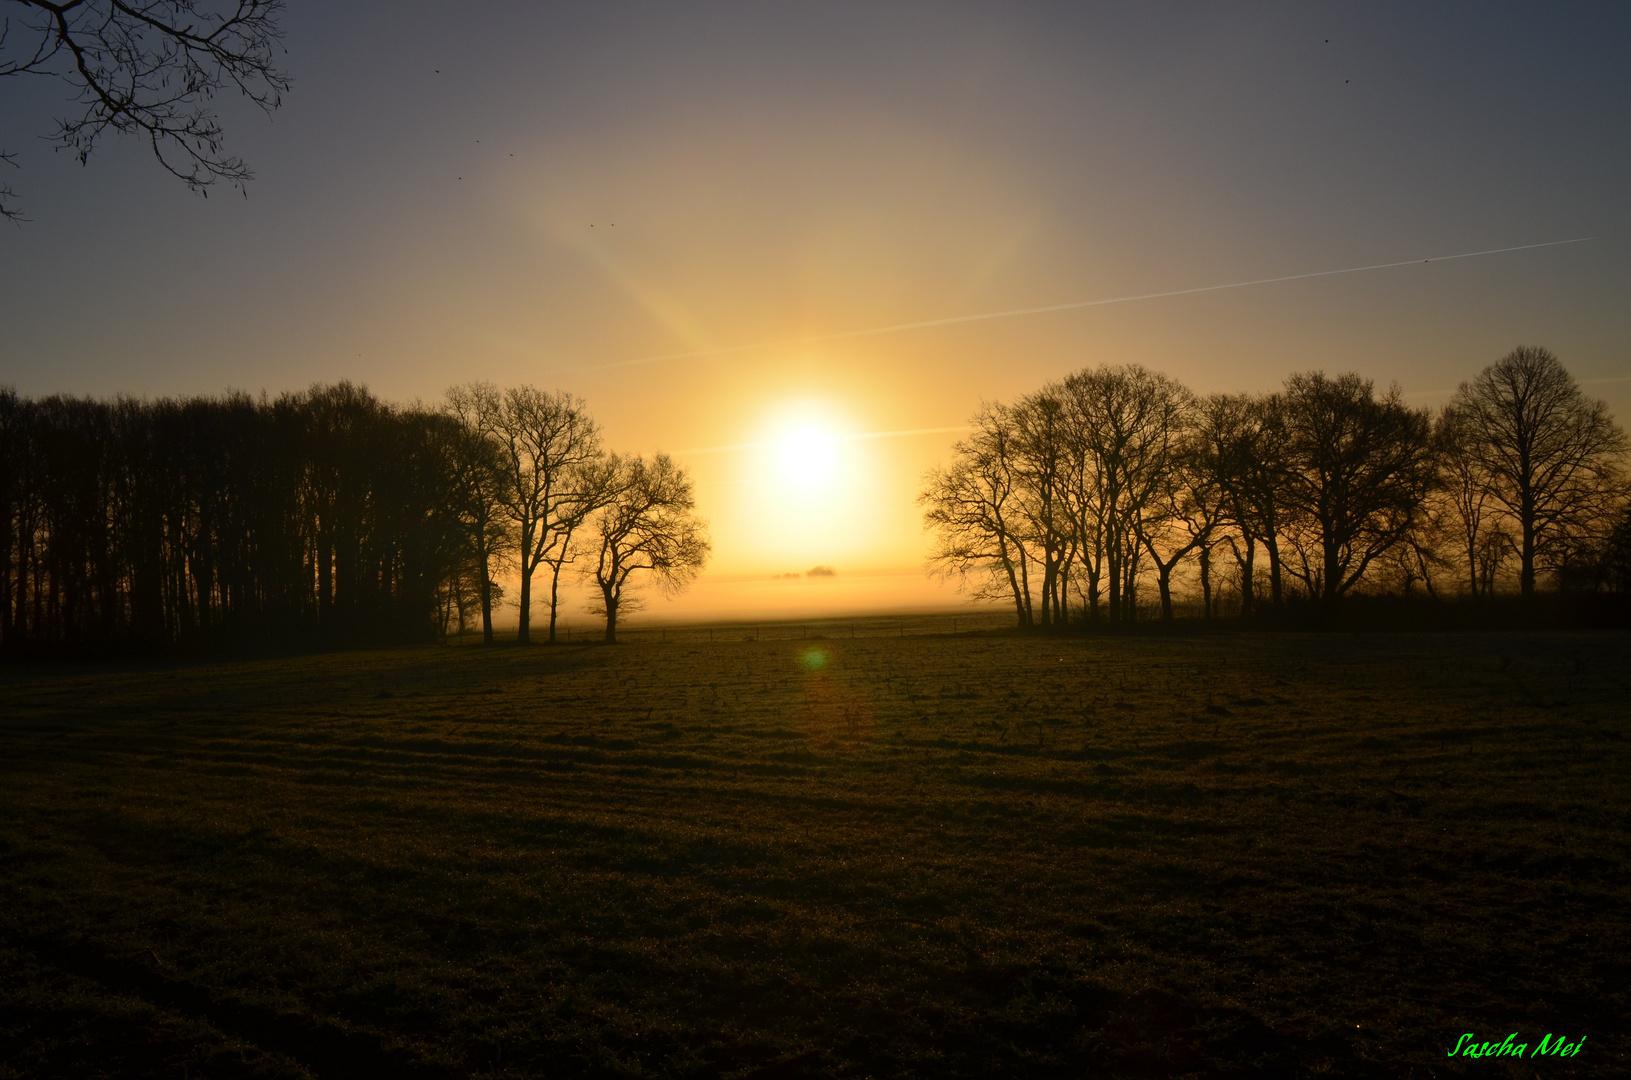 Morgengruss